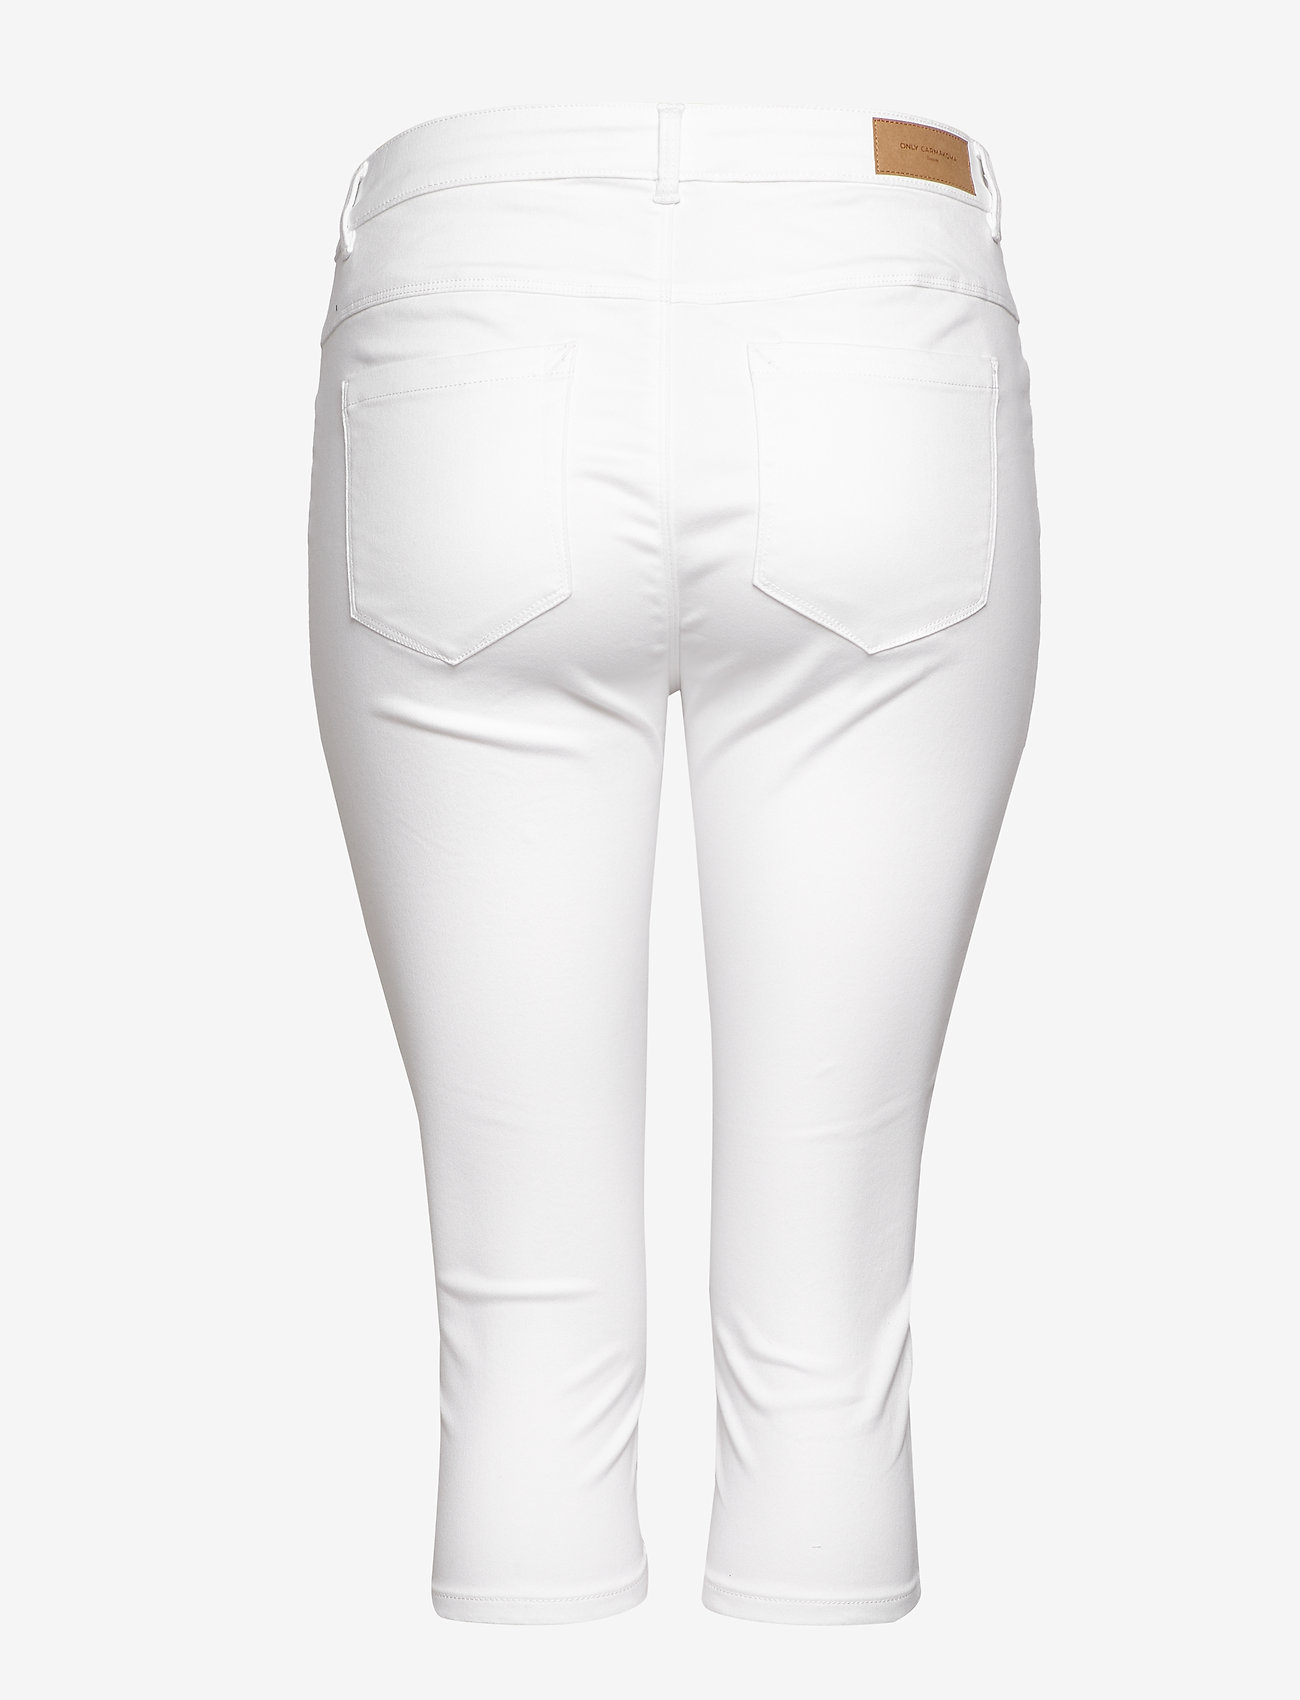 ONLY Carmakoma - CARAUGUSTA LIFE HW SKINNY KNICKERS WHITE - pantalons capri - white - 1